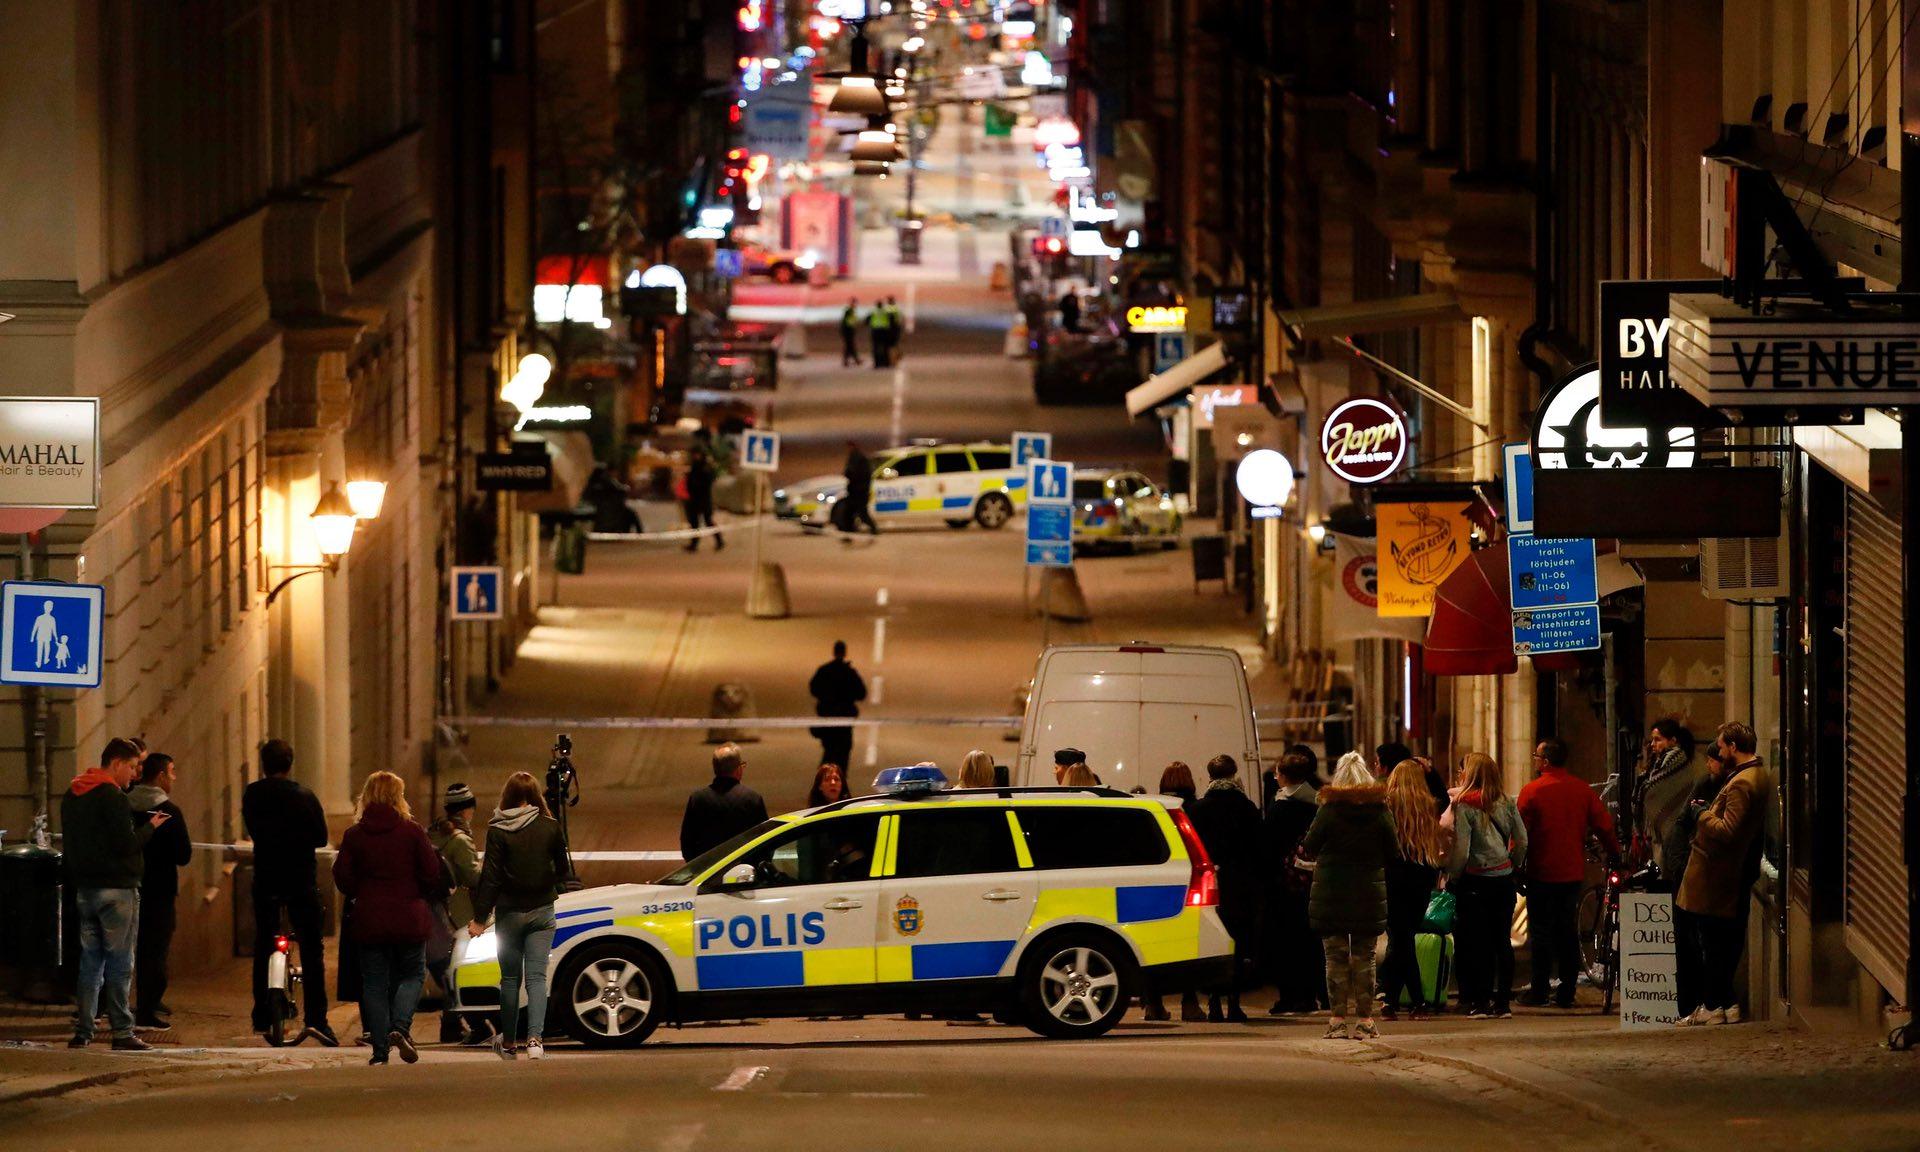 Stockholm truck attack suspect was facing deportation